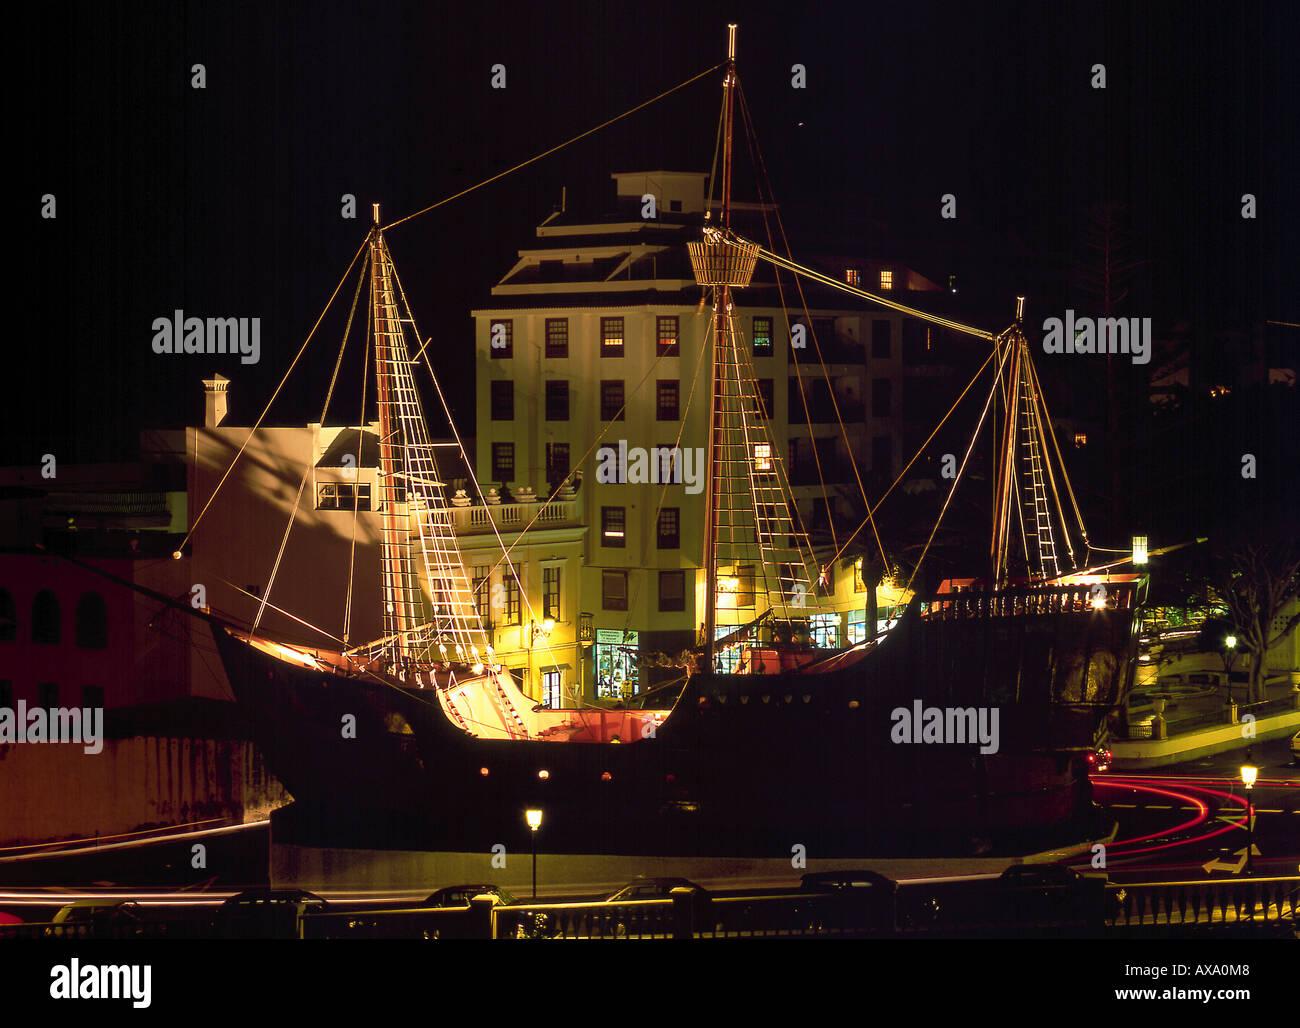 Kolumbus-Schiff, Schiffahrtsmuseum, Santa Cruz de la Palma, La Palma Kanarische Inseln, Spanien Stock Photo